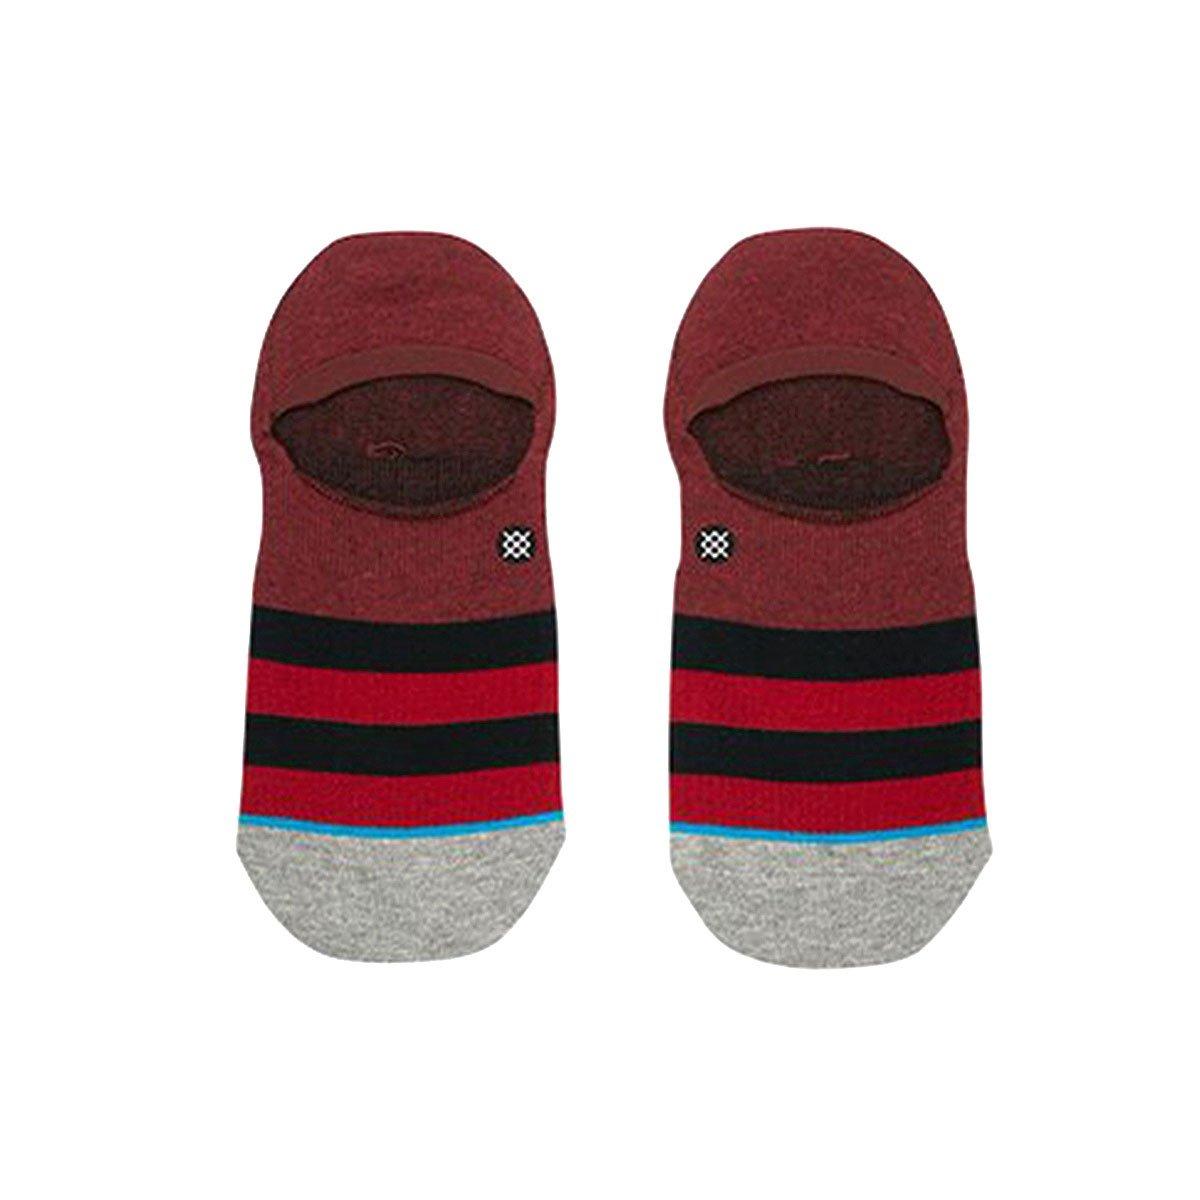 Носки низкие Stance Side Step Sadelow Real Red